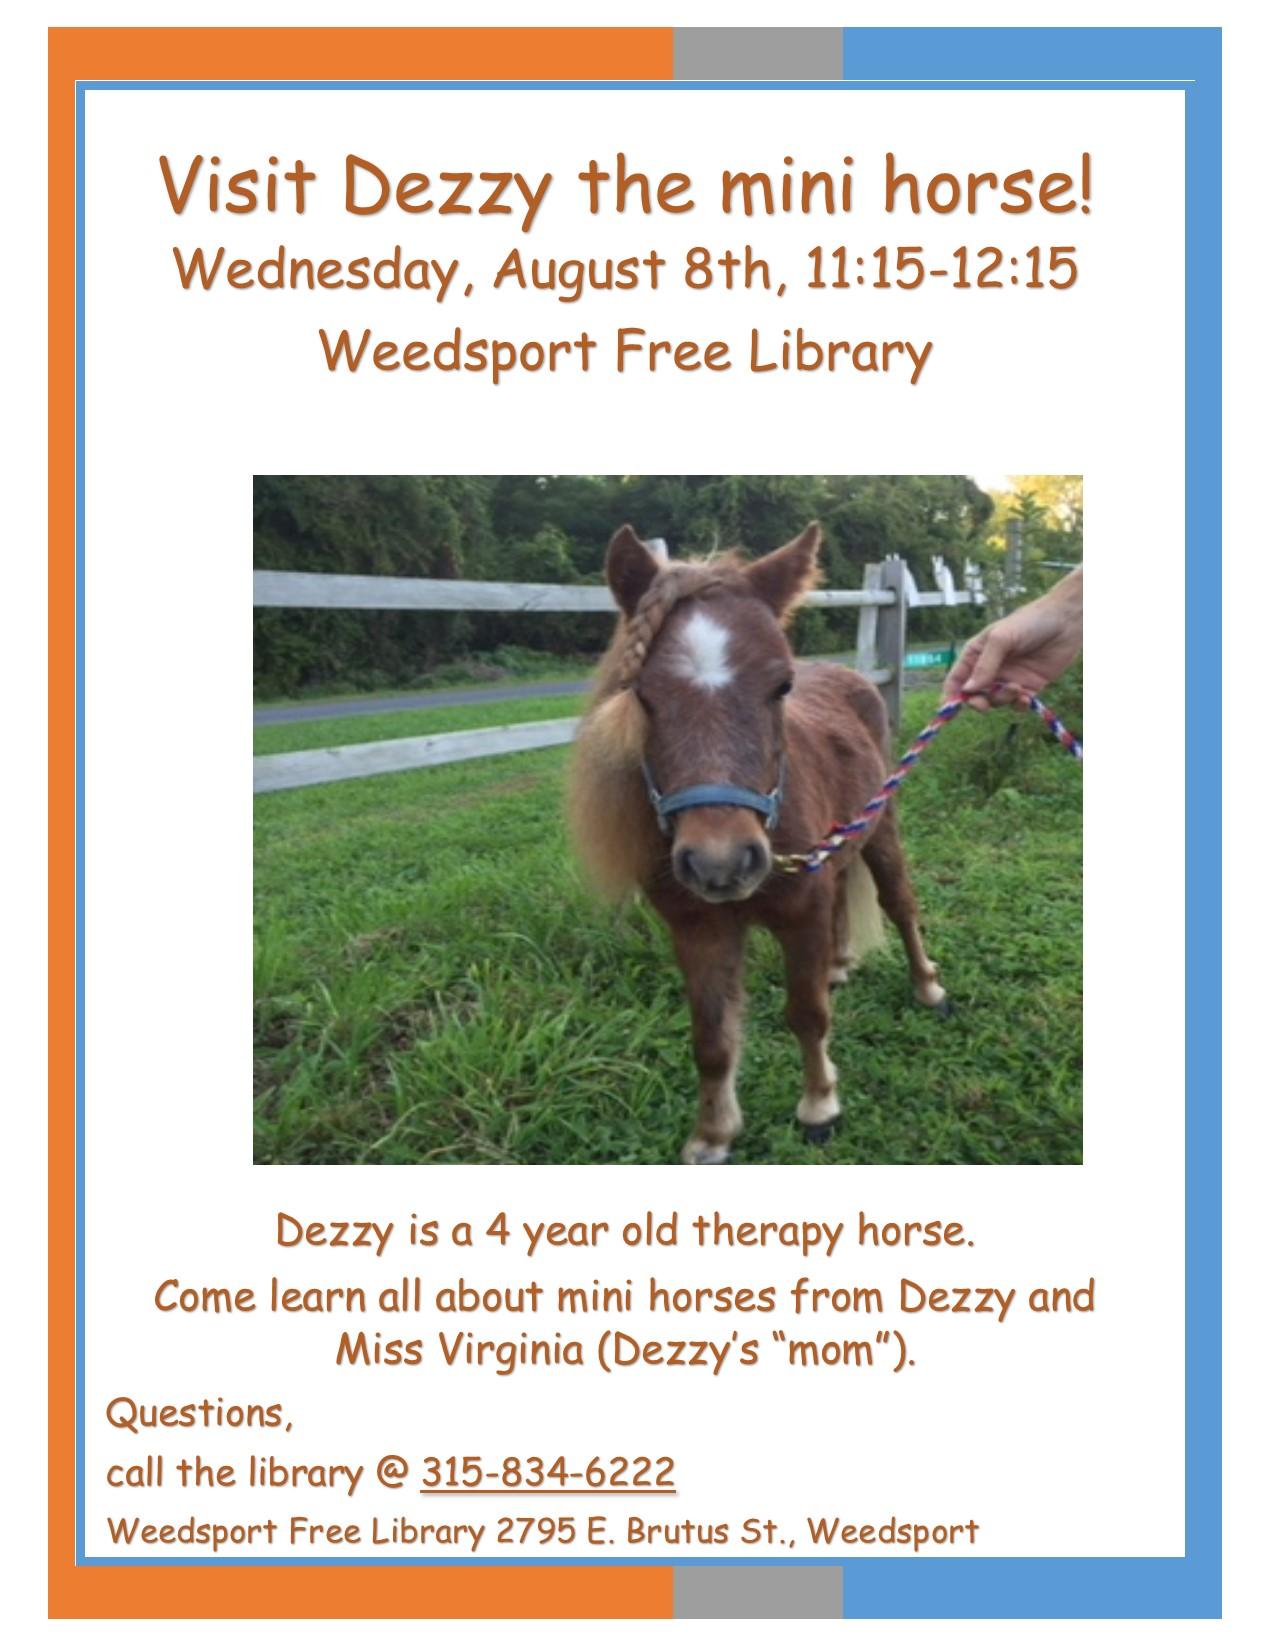 Dezzy The Mini Horse Weedsportlibraryorg